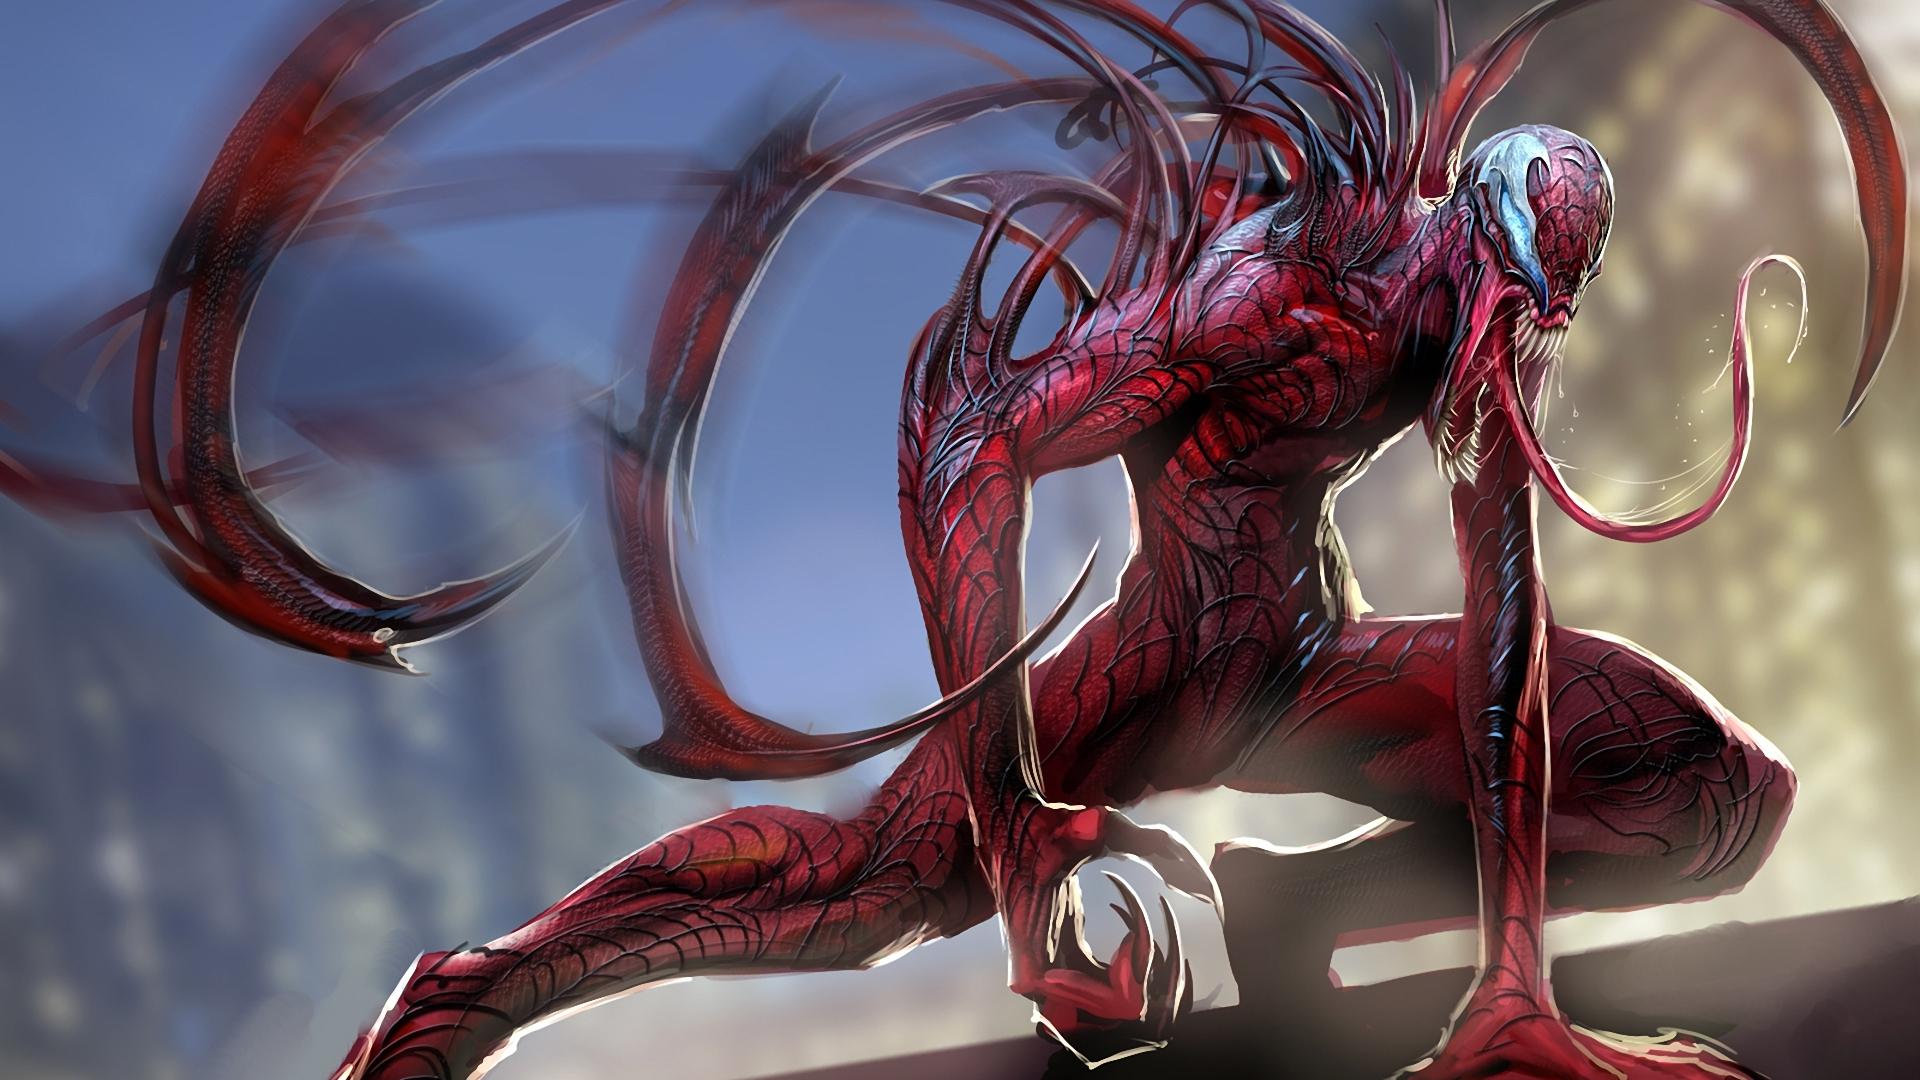 spiderman wallappers for desktop (25)